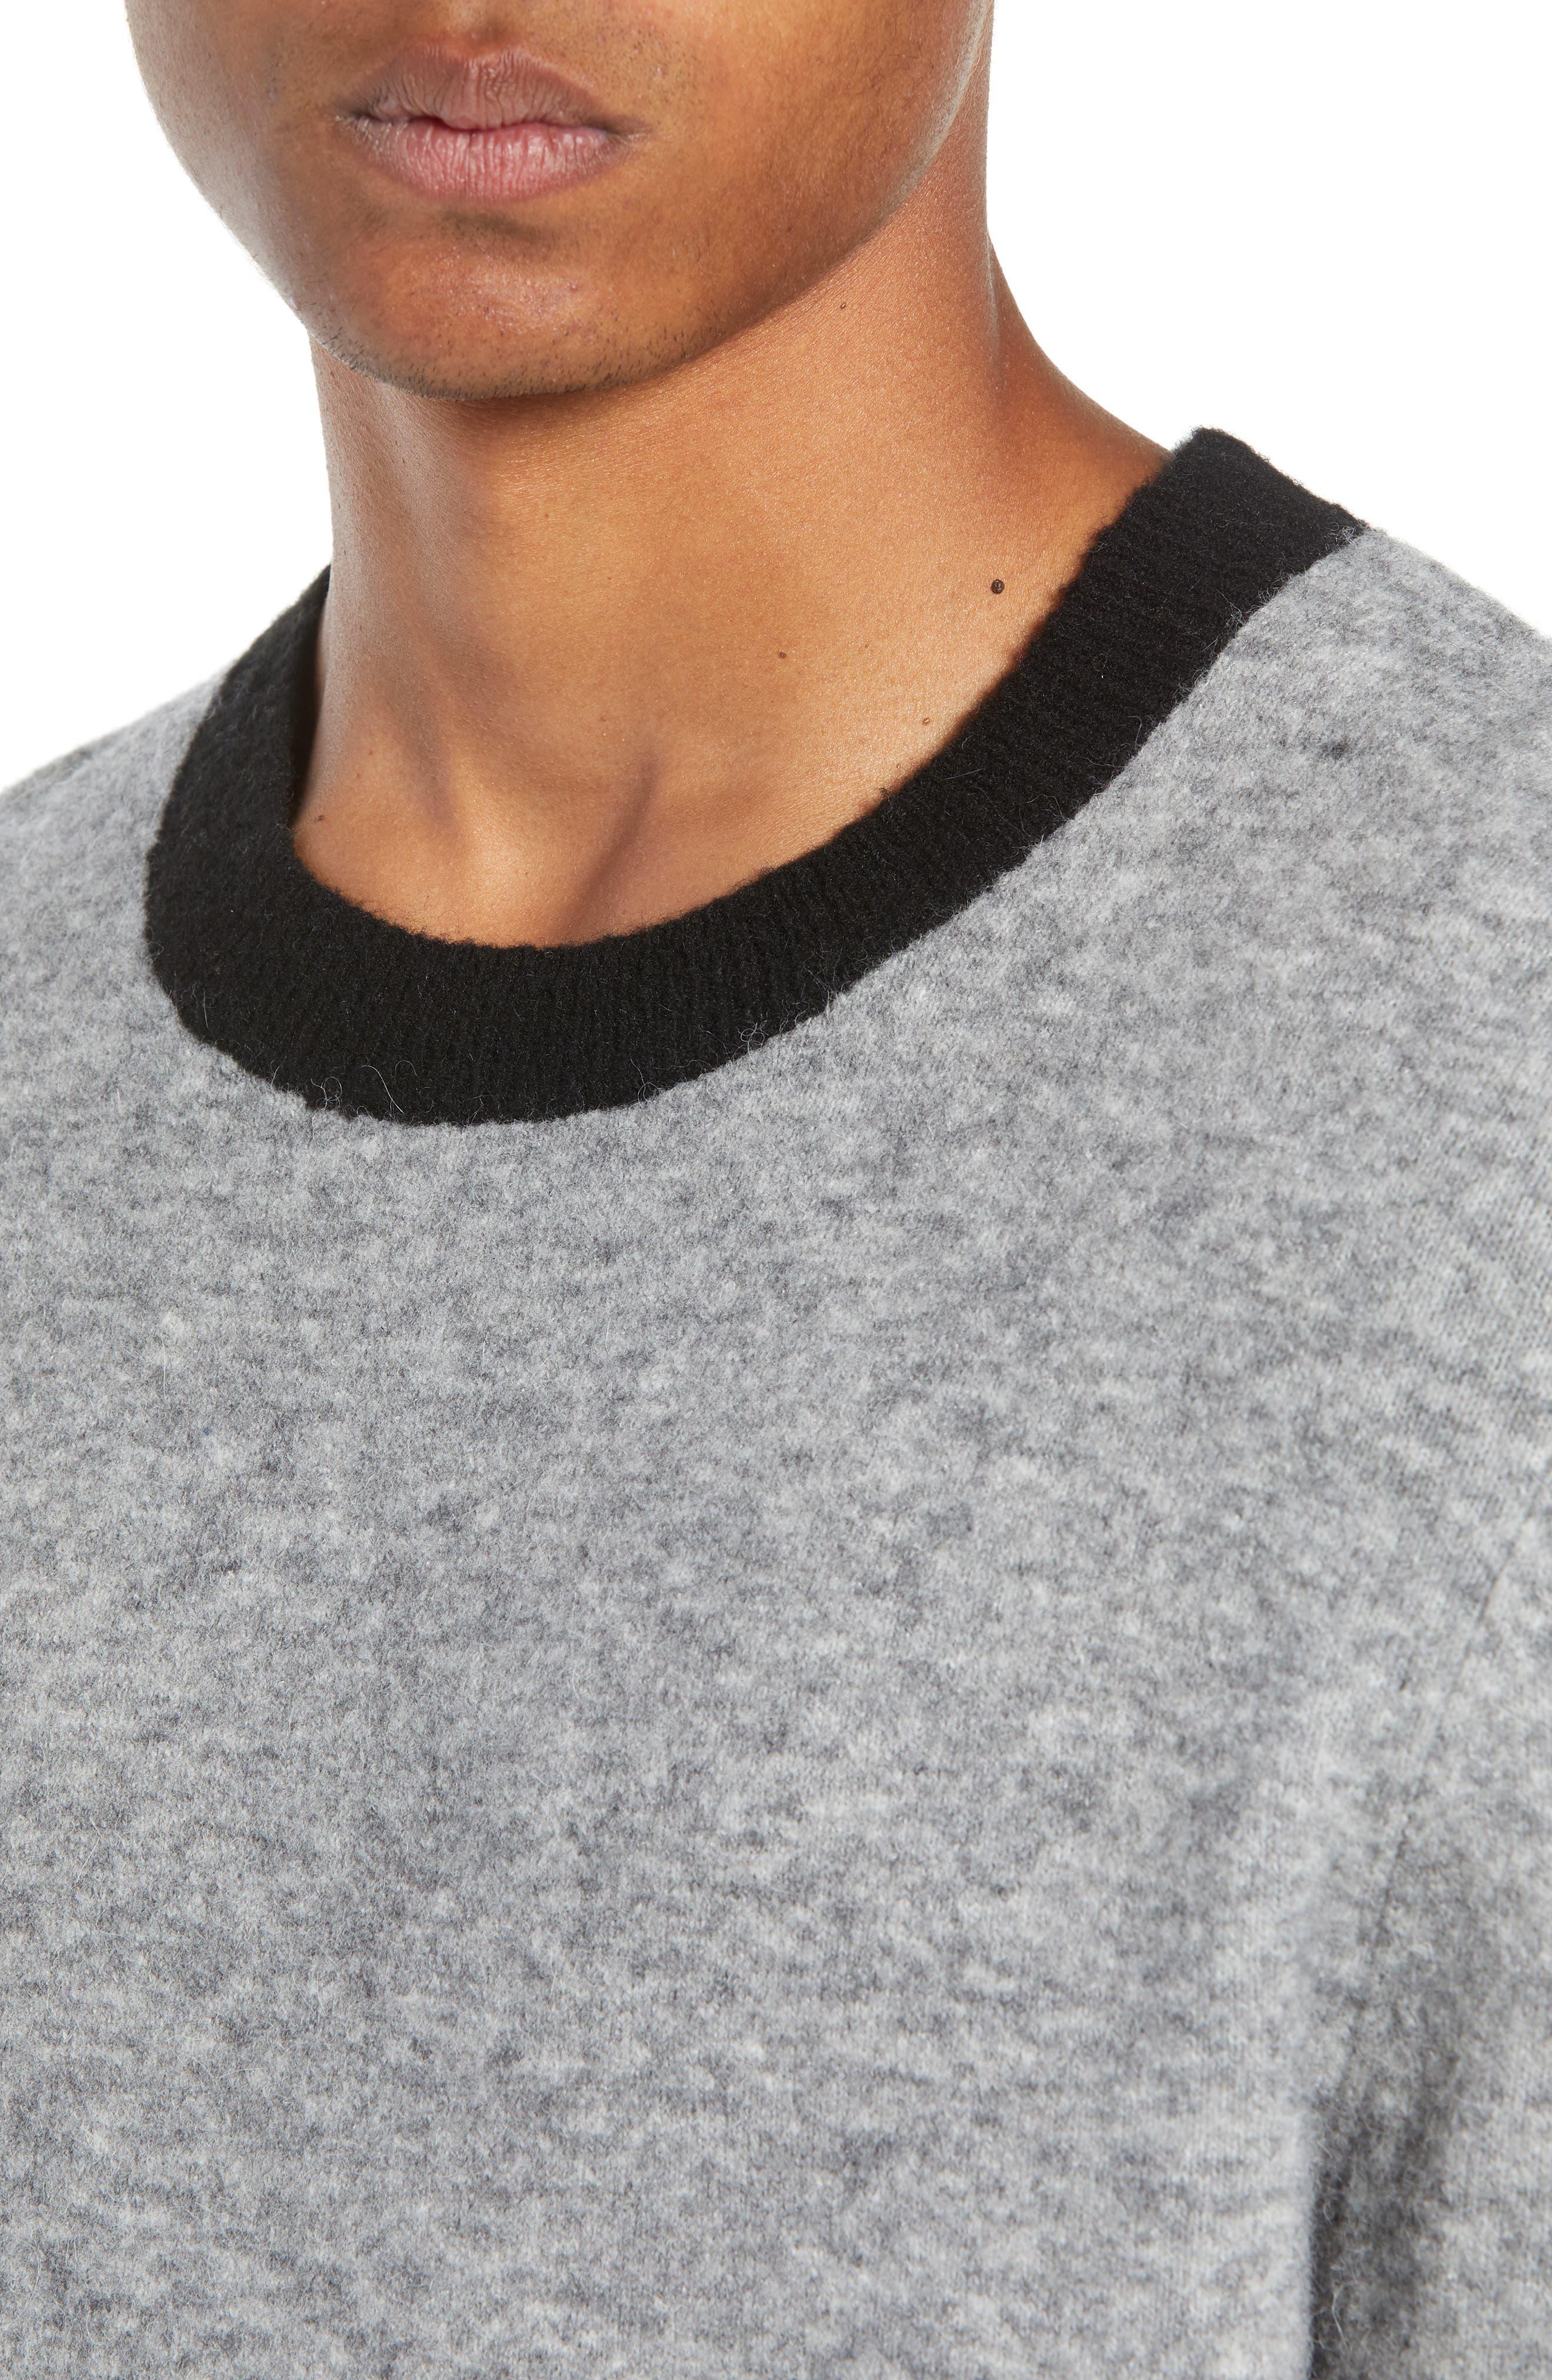 Clermont Slim Fit Crewneck Sweater,                             Alternate thumbnail 4, color,                             LIGHT HEATHER GREY